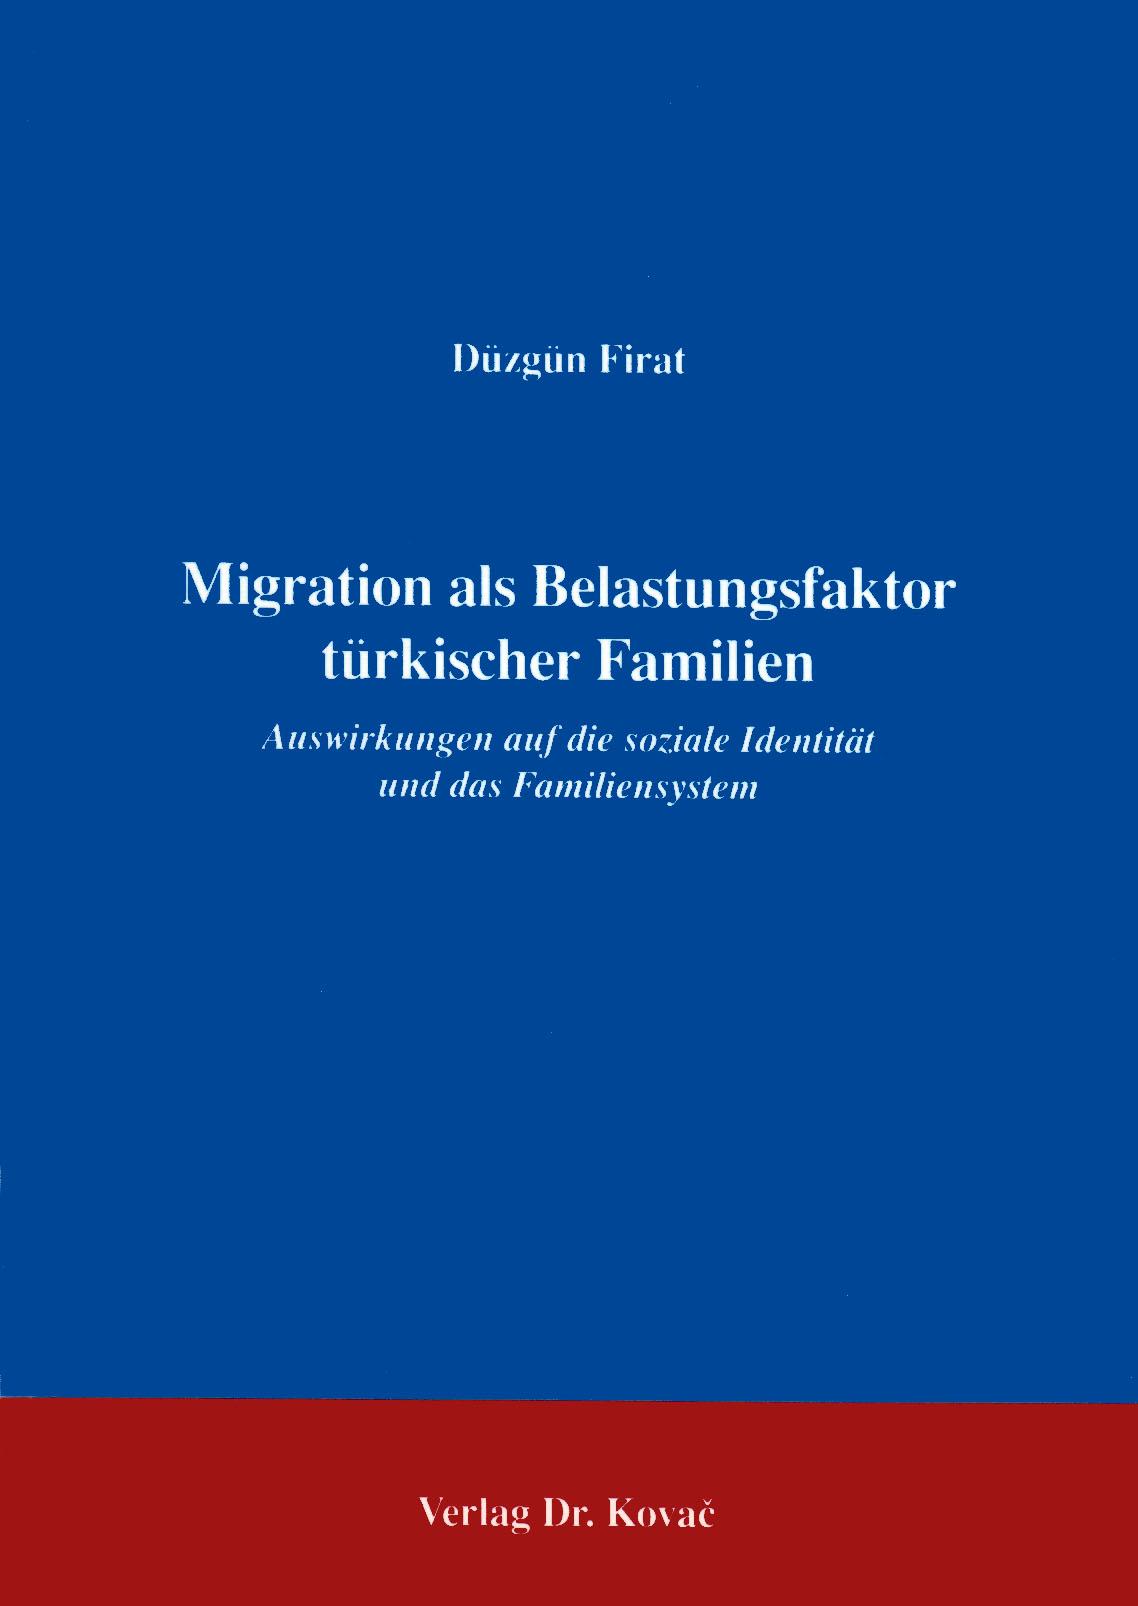 Cover: Die Migration als Belastungsfaktor türkischer Familien